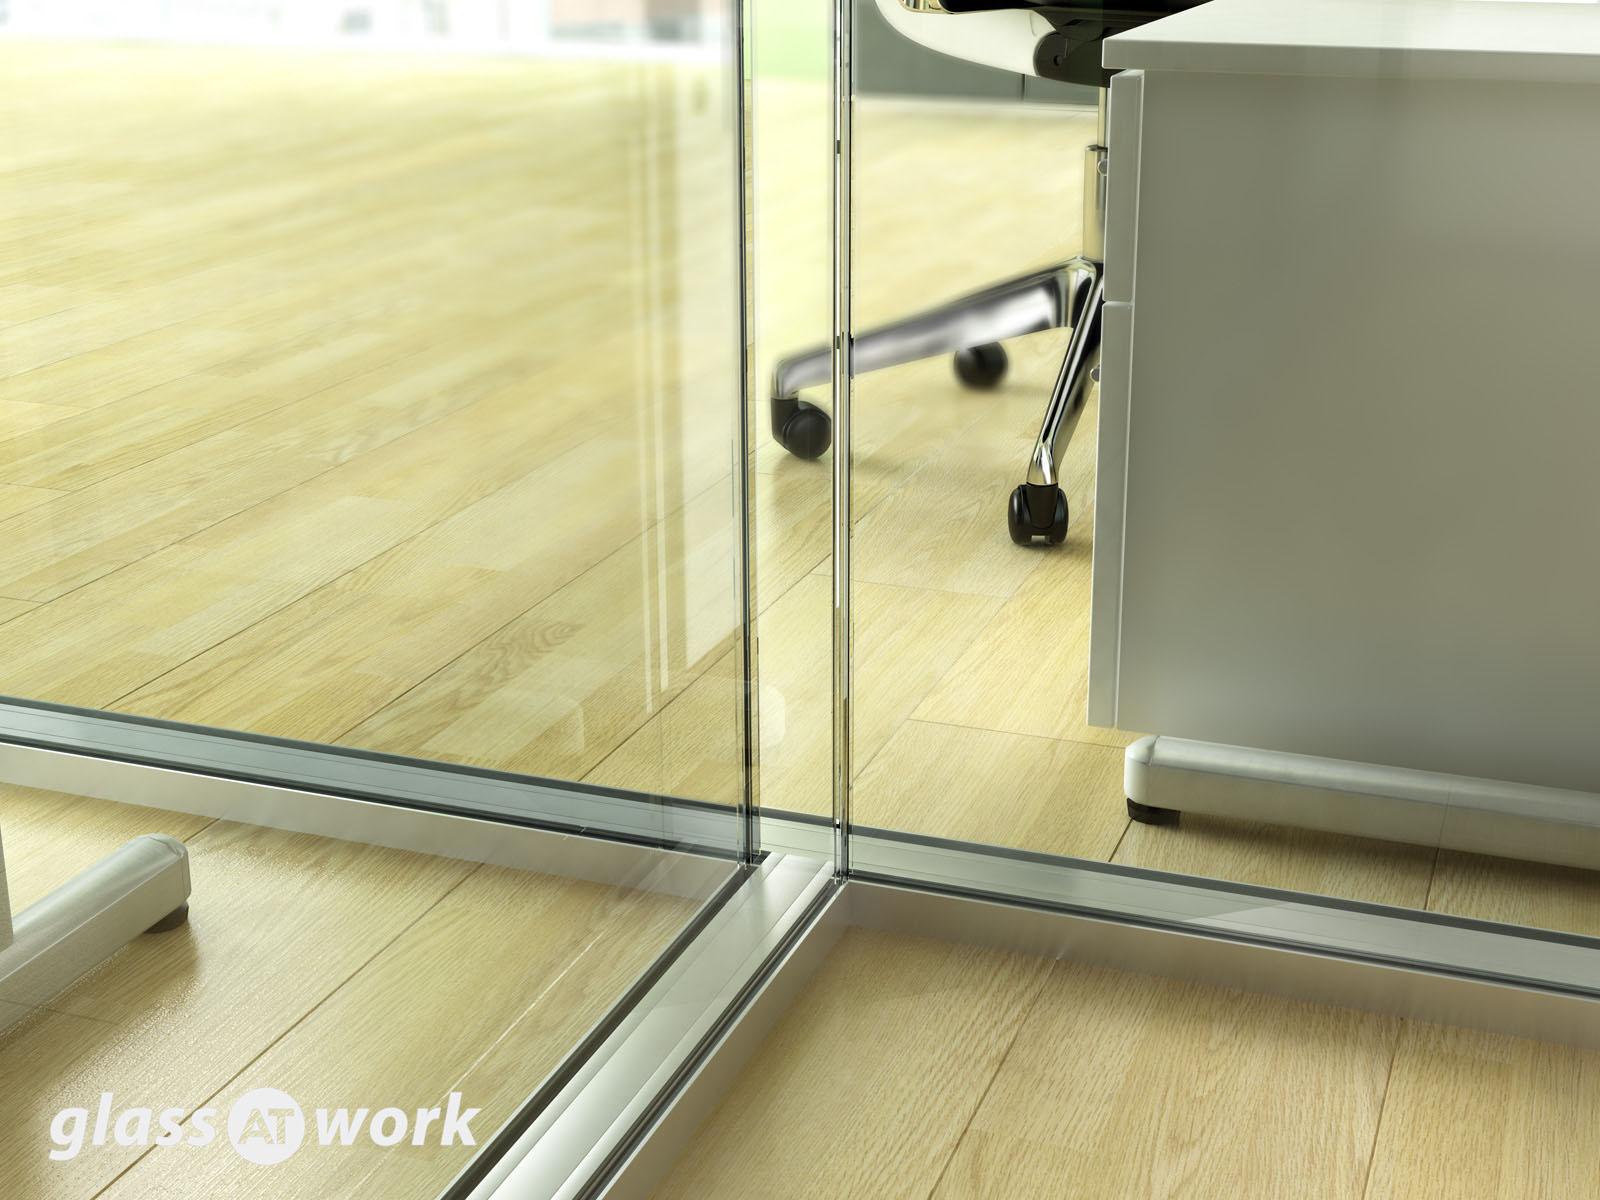 office glass door glazed. Office Glass Door Glazed M